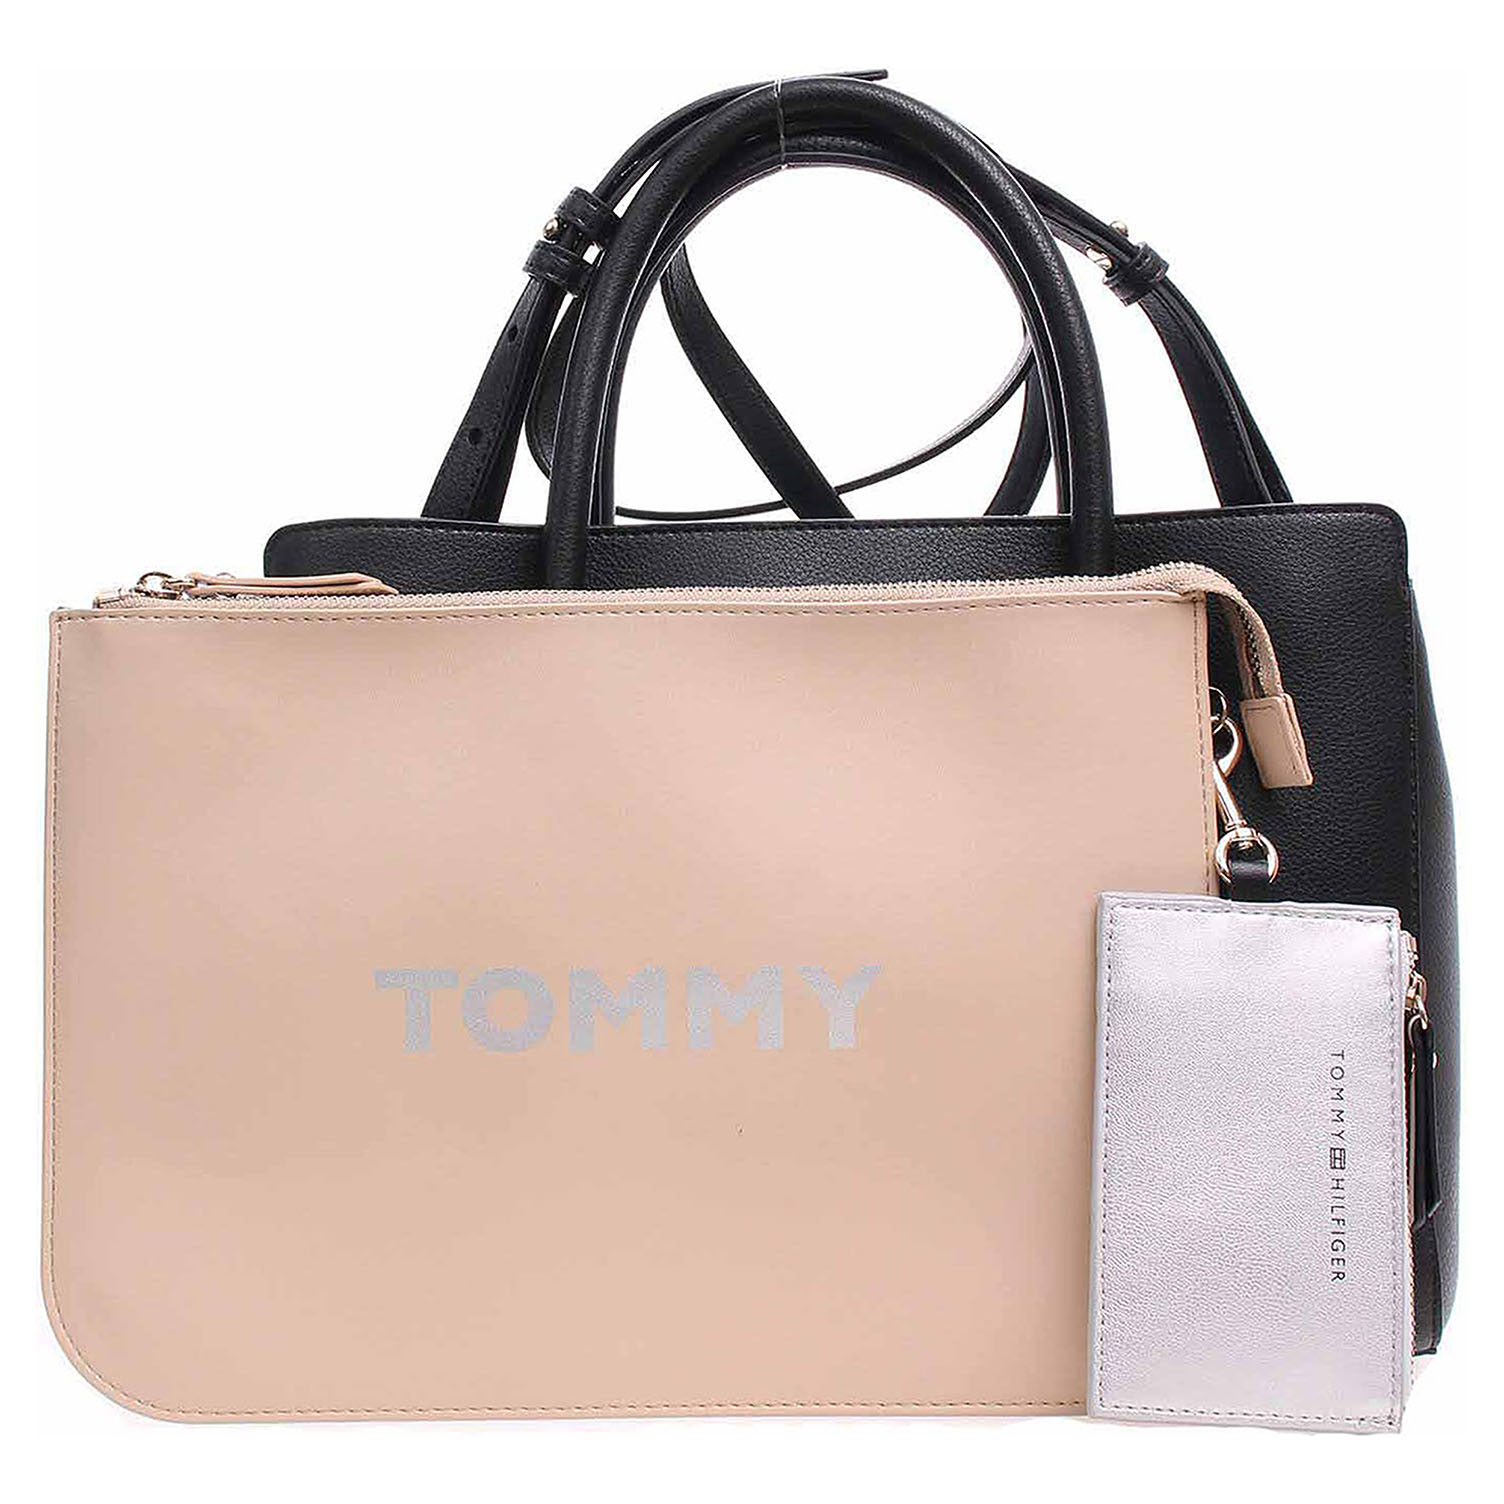 Ecco Tommy Hilfiger dámská kabelka AW0AW06487 002 black-warm sand 11891495 d155b29b70d